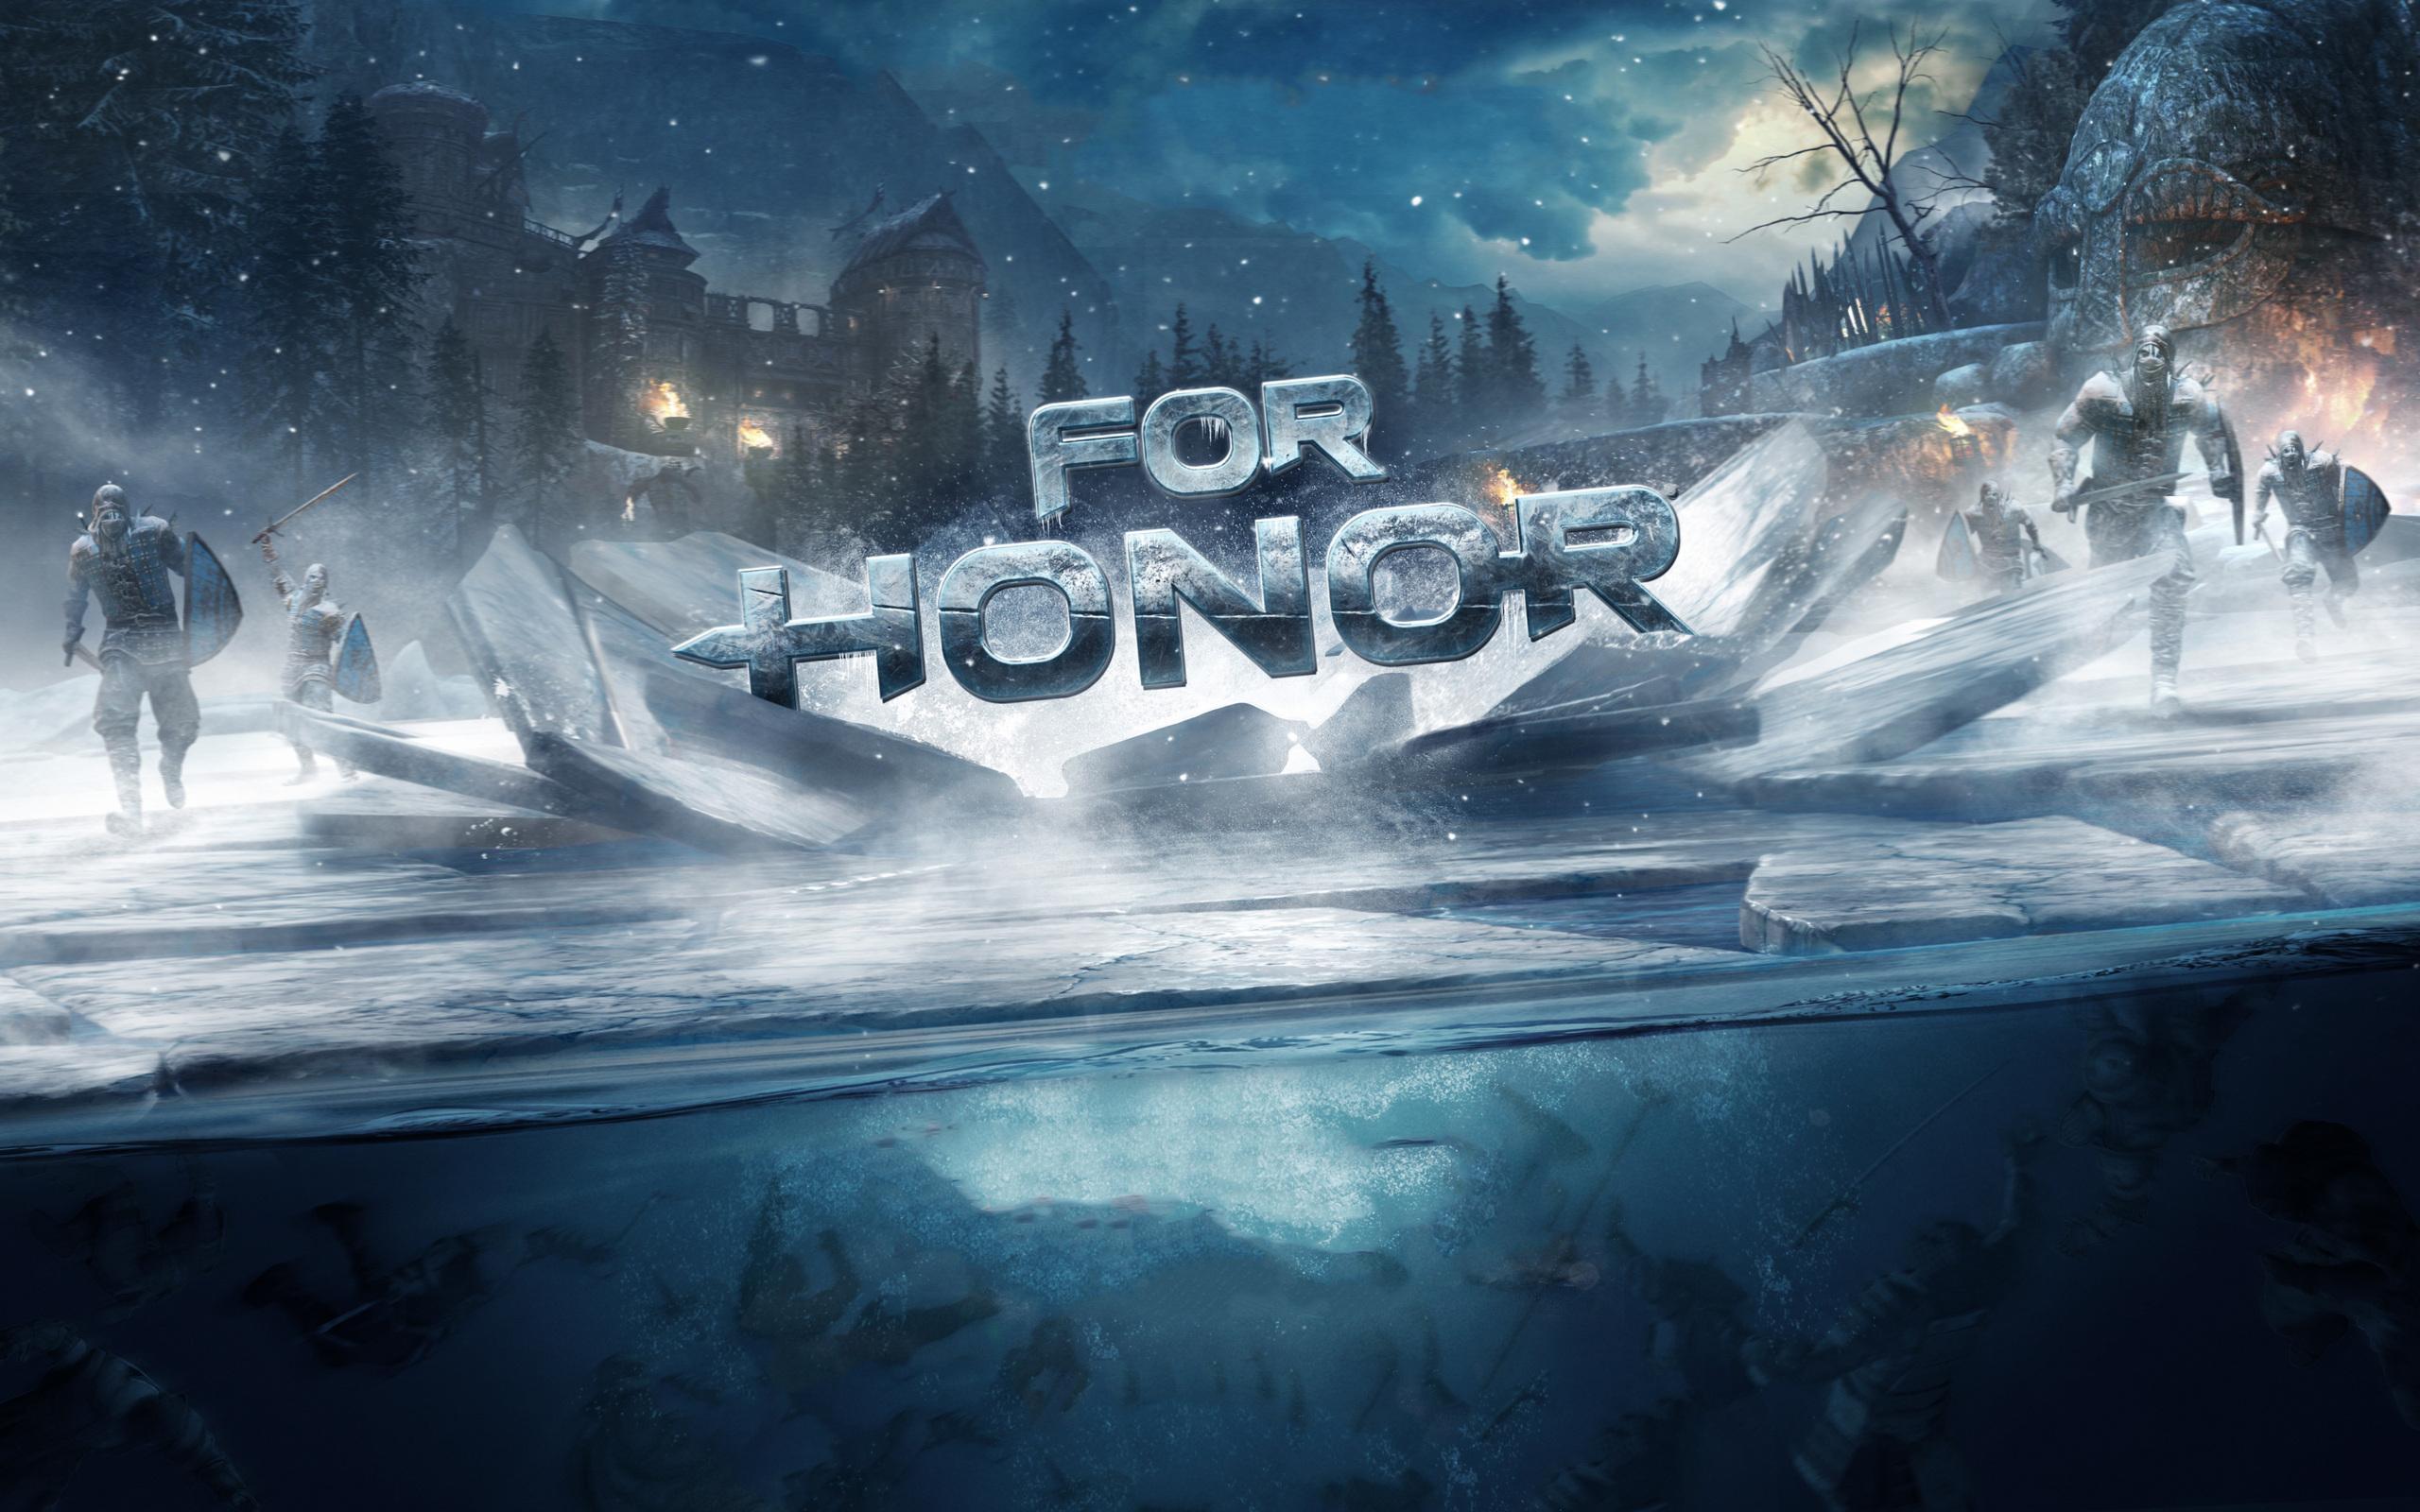 for-honor-frost-wind-4k-ux.jpg